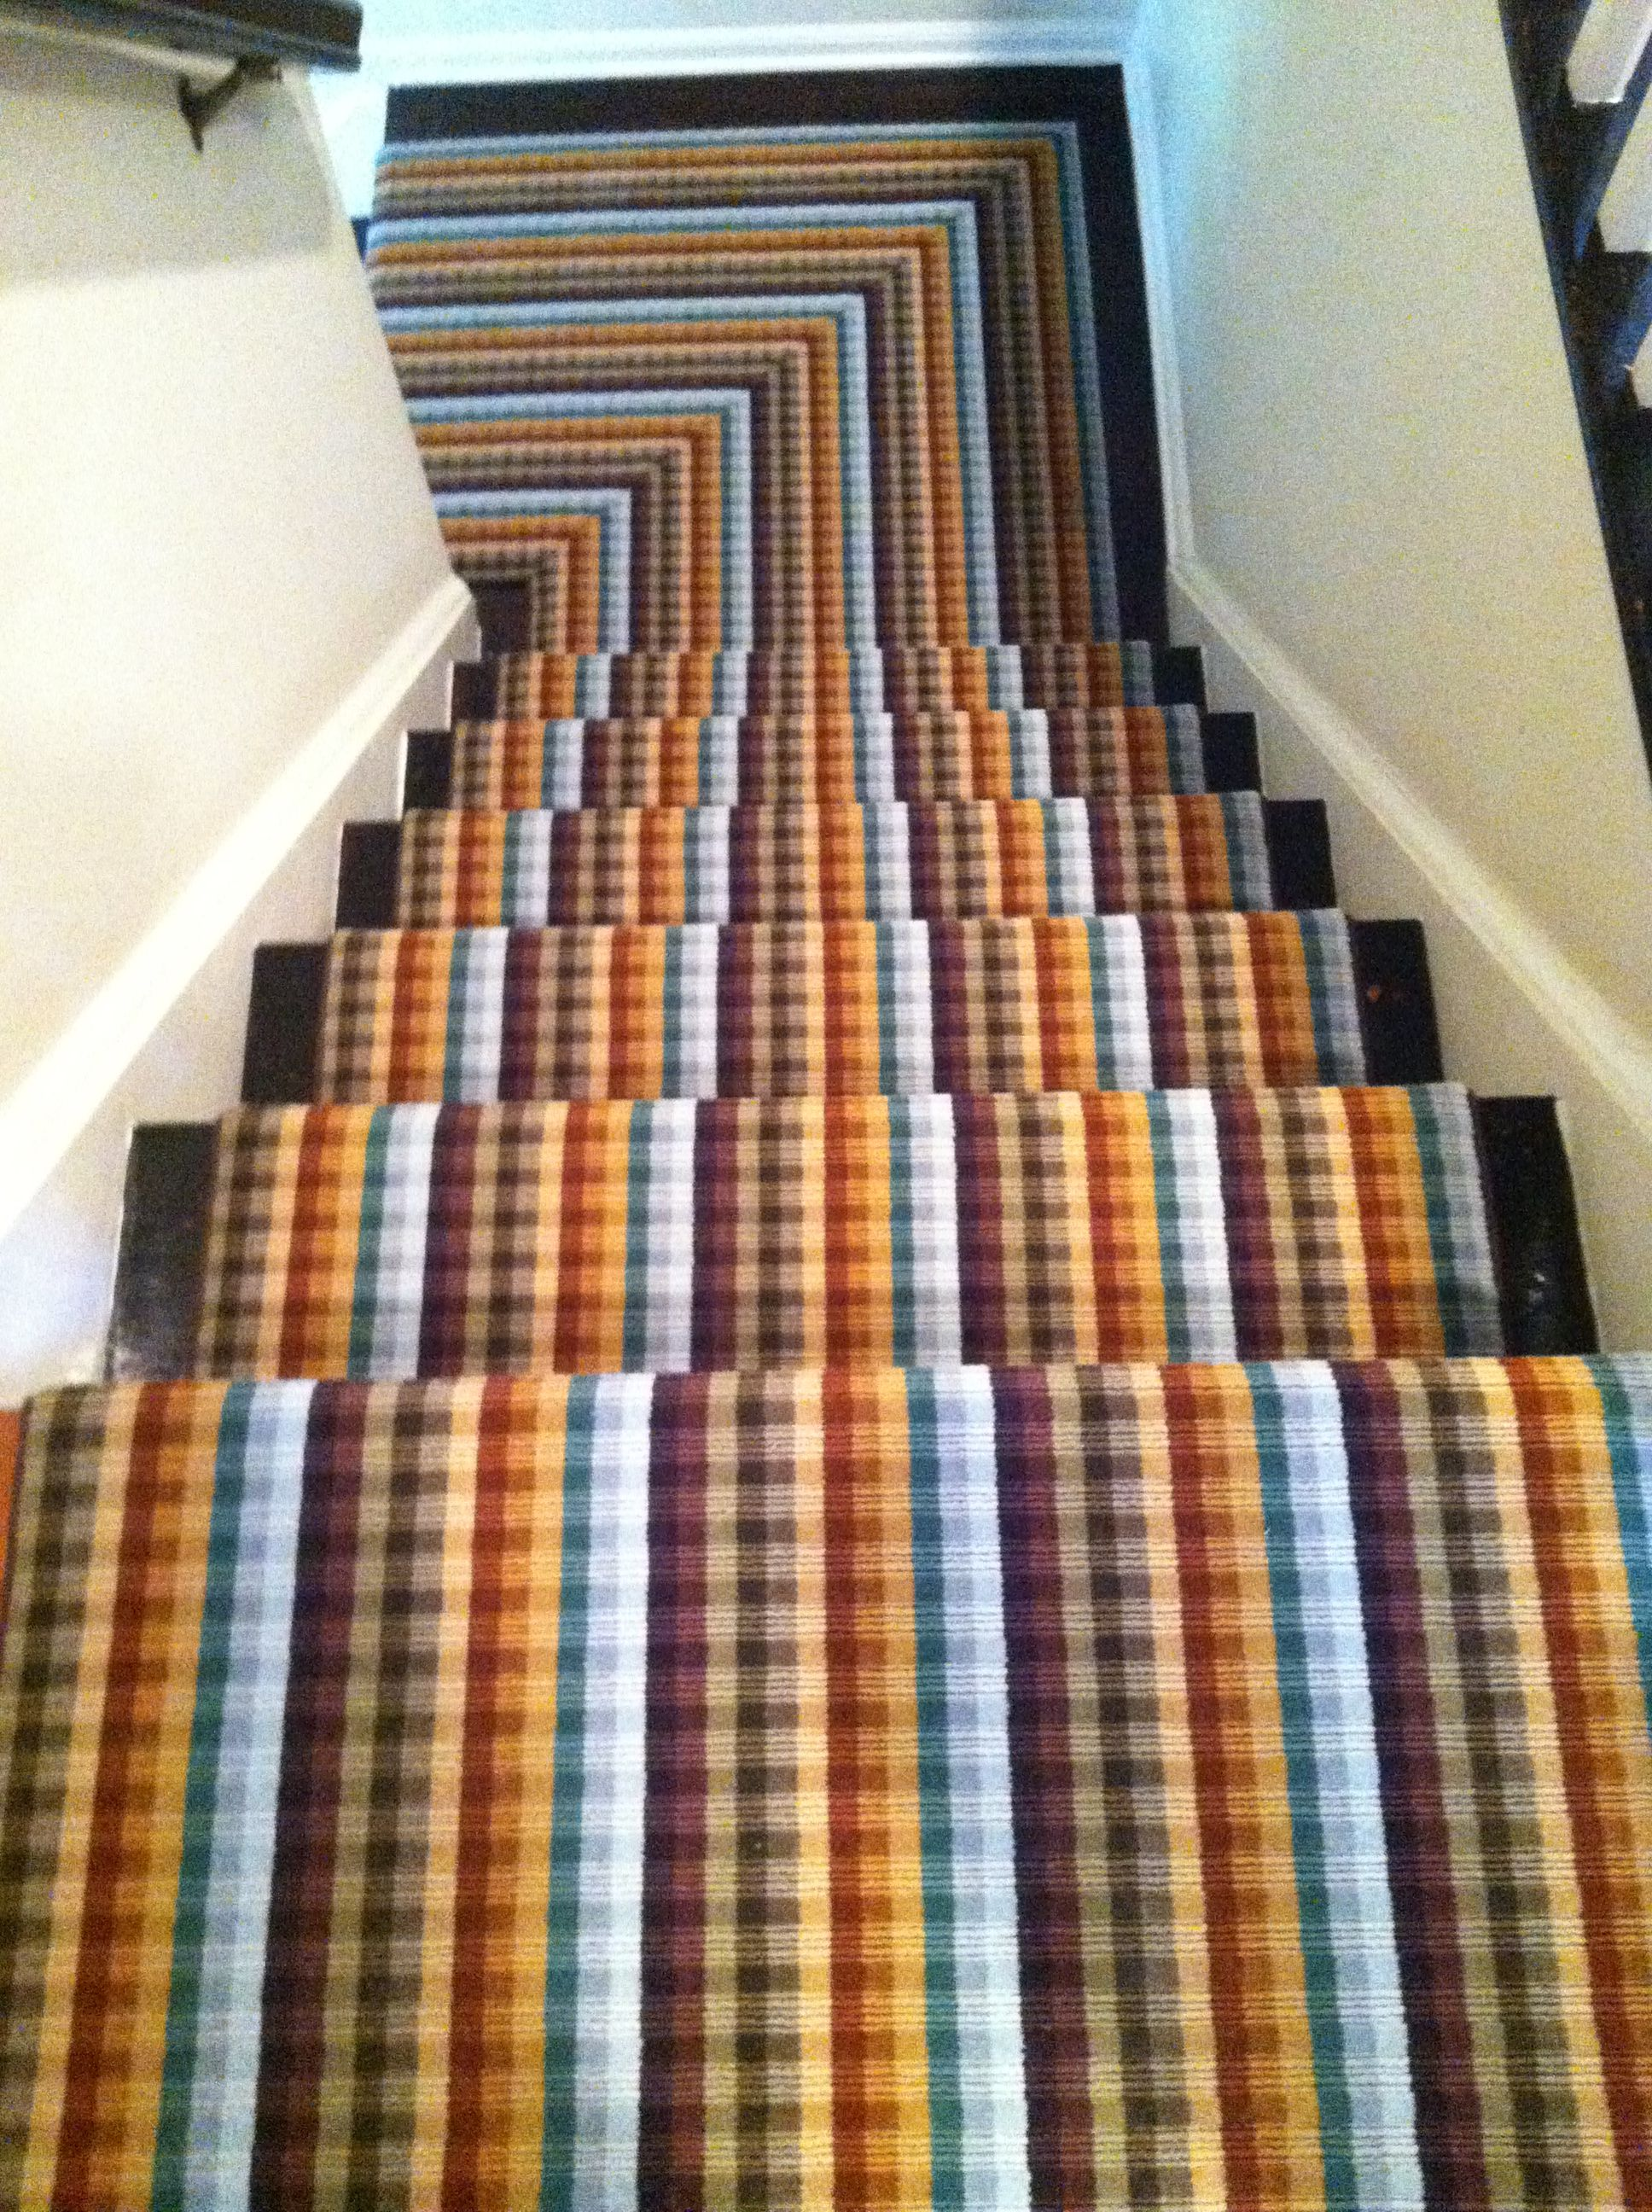 Hemphills Rugs Carpets Orange County Carpet Wood Floor Area With Prices